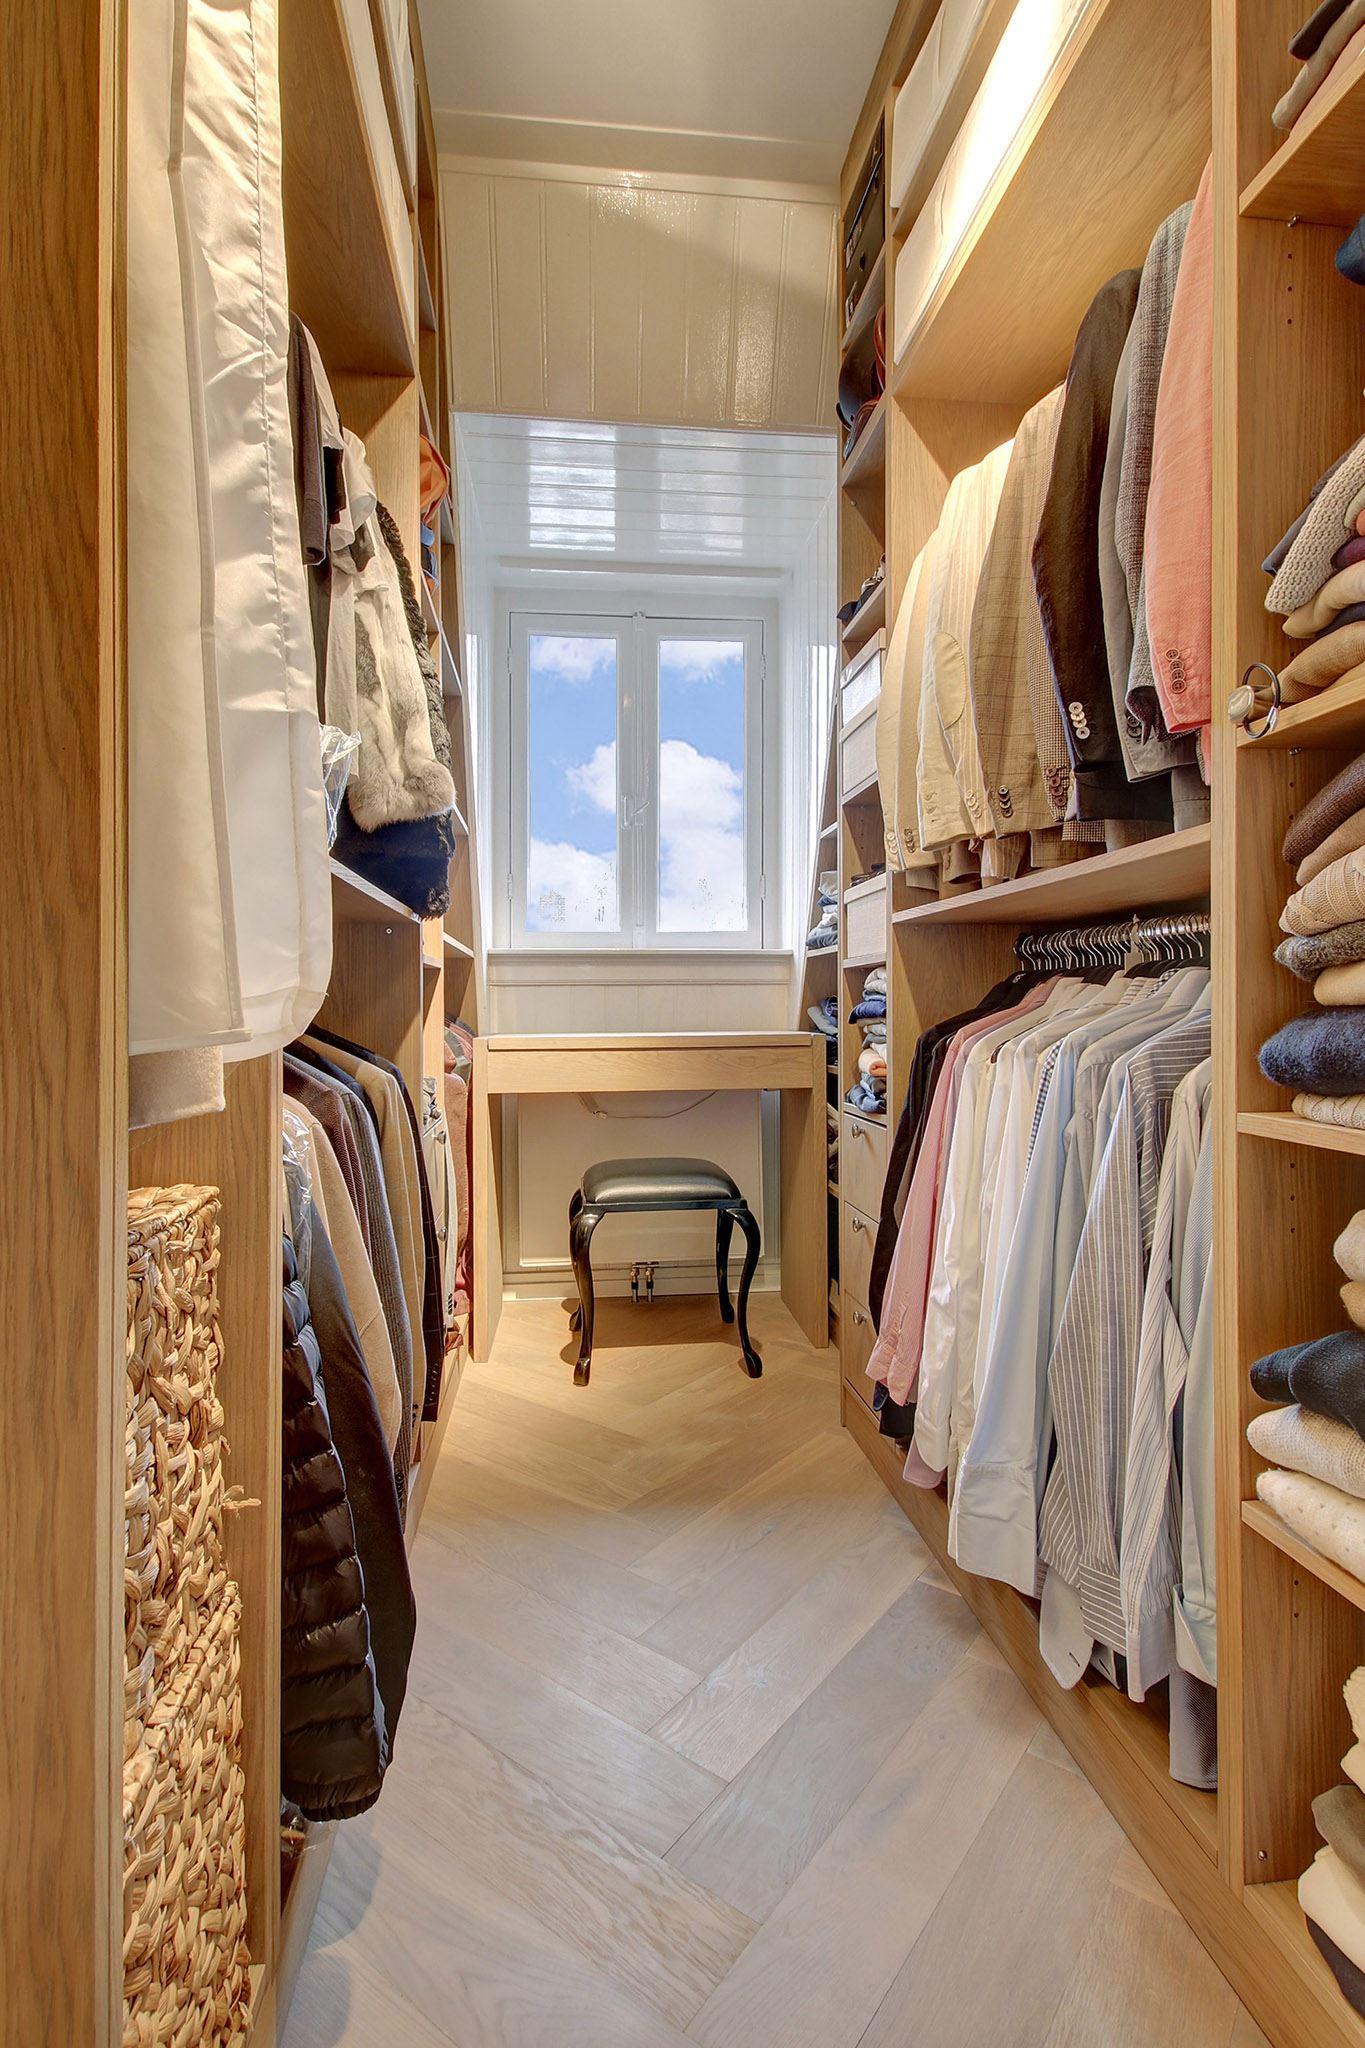 гардеробная комната окно паркет елочка